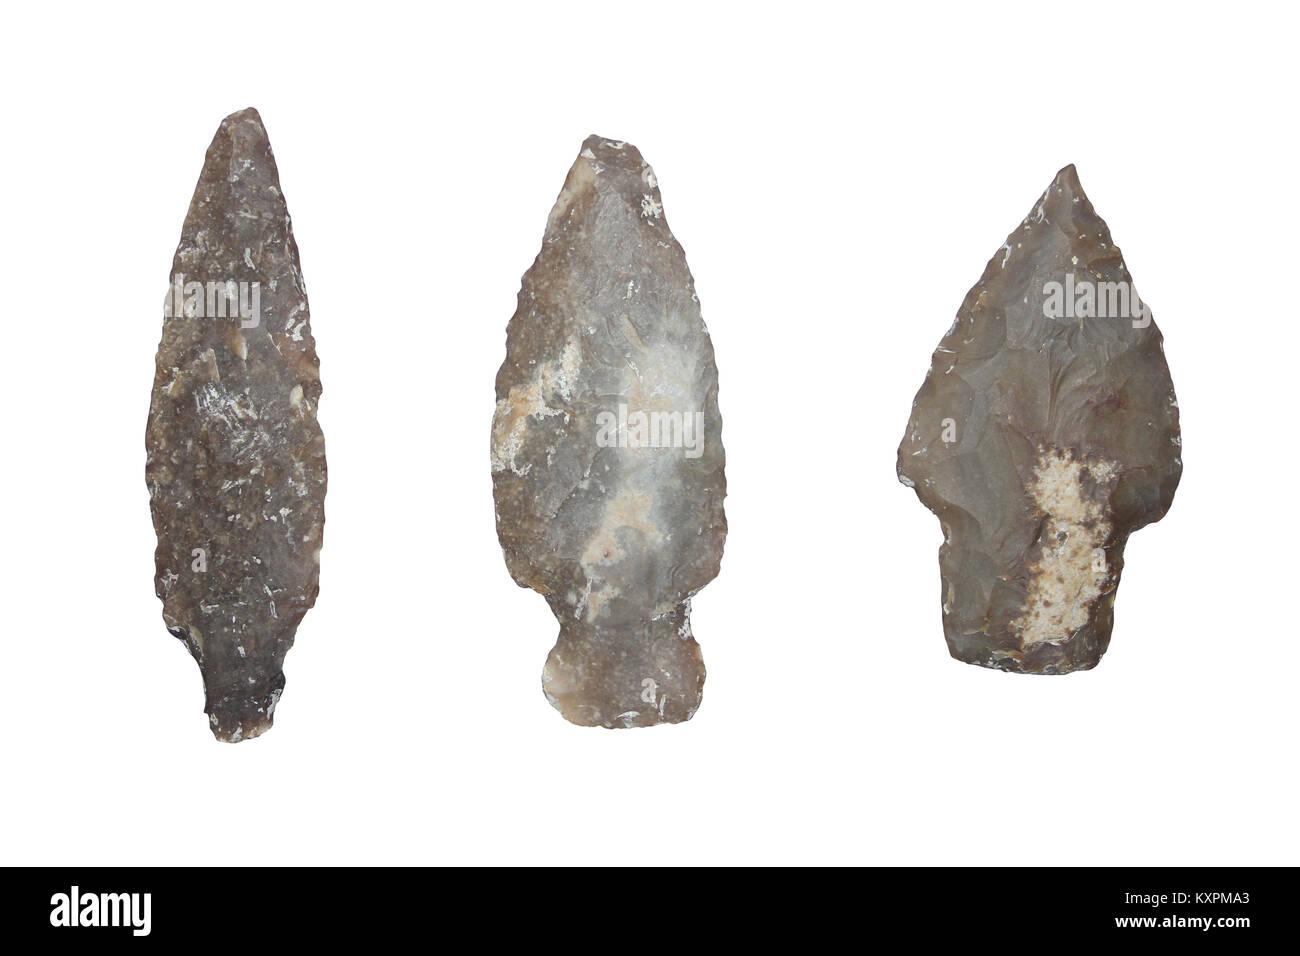 Mayan Flint Arrowheads, Belize (Late Classic Period 800-900 A.D.) - Stock Image